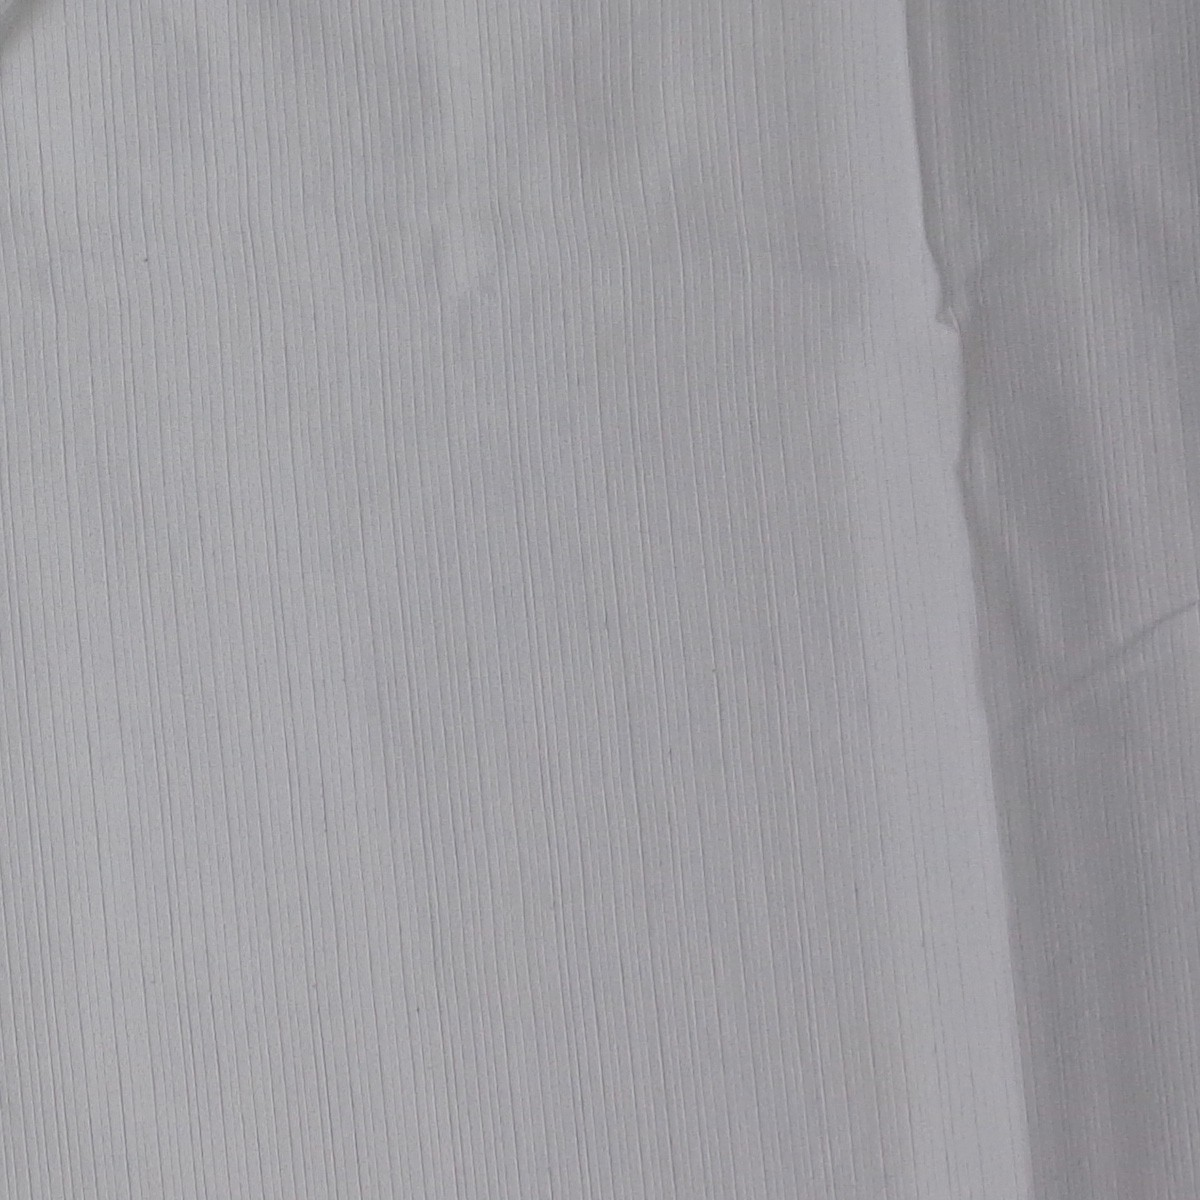 Cortina Rústica Pantex 2,60x1,70m Cru - Bella Janela